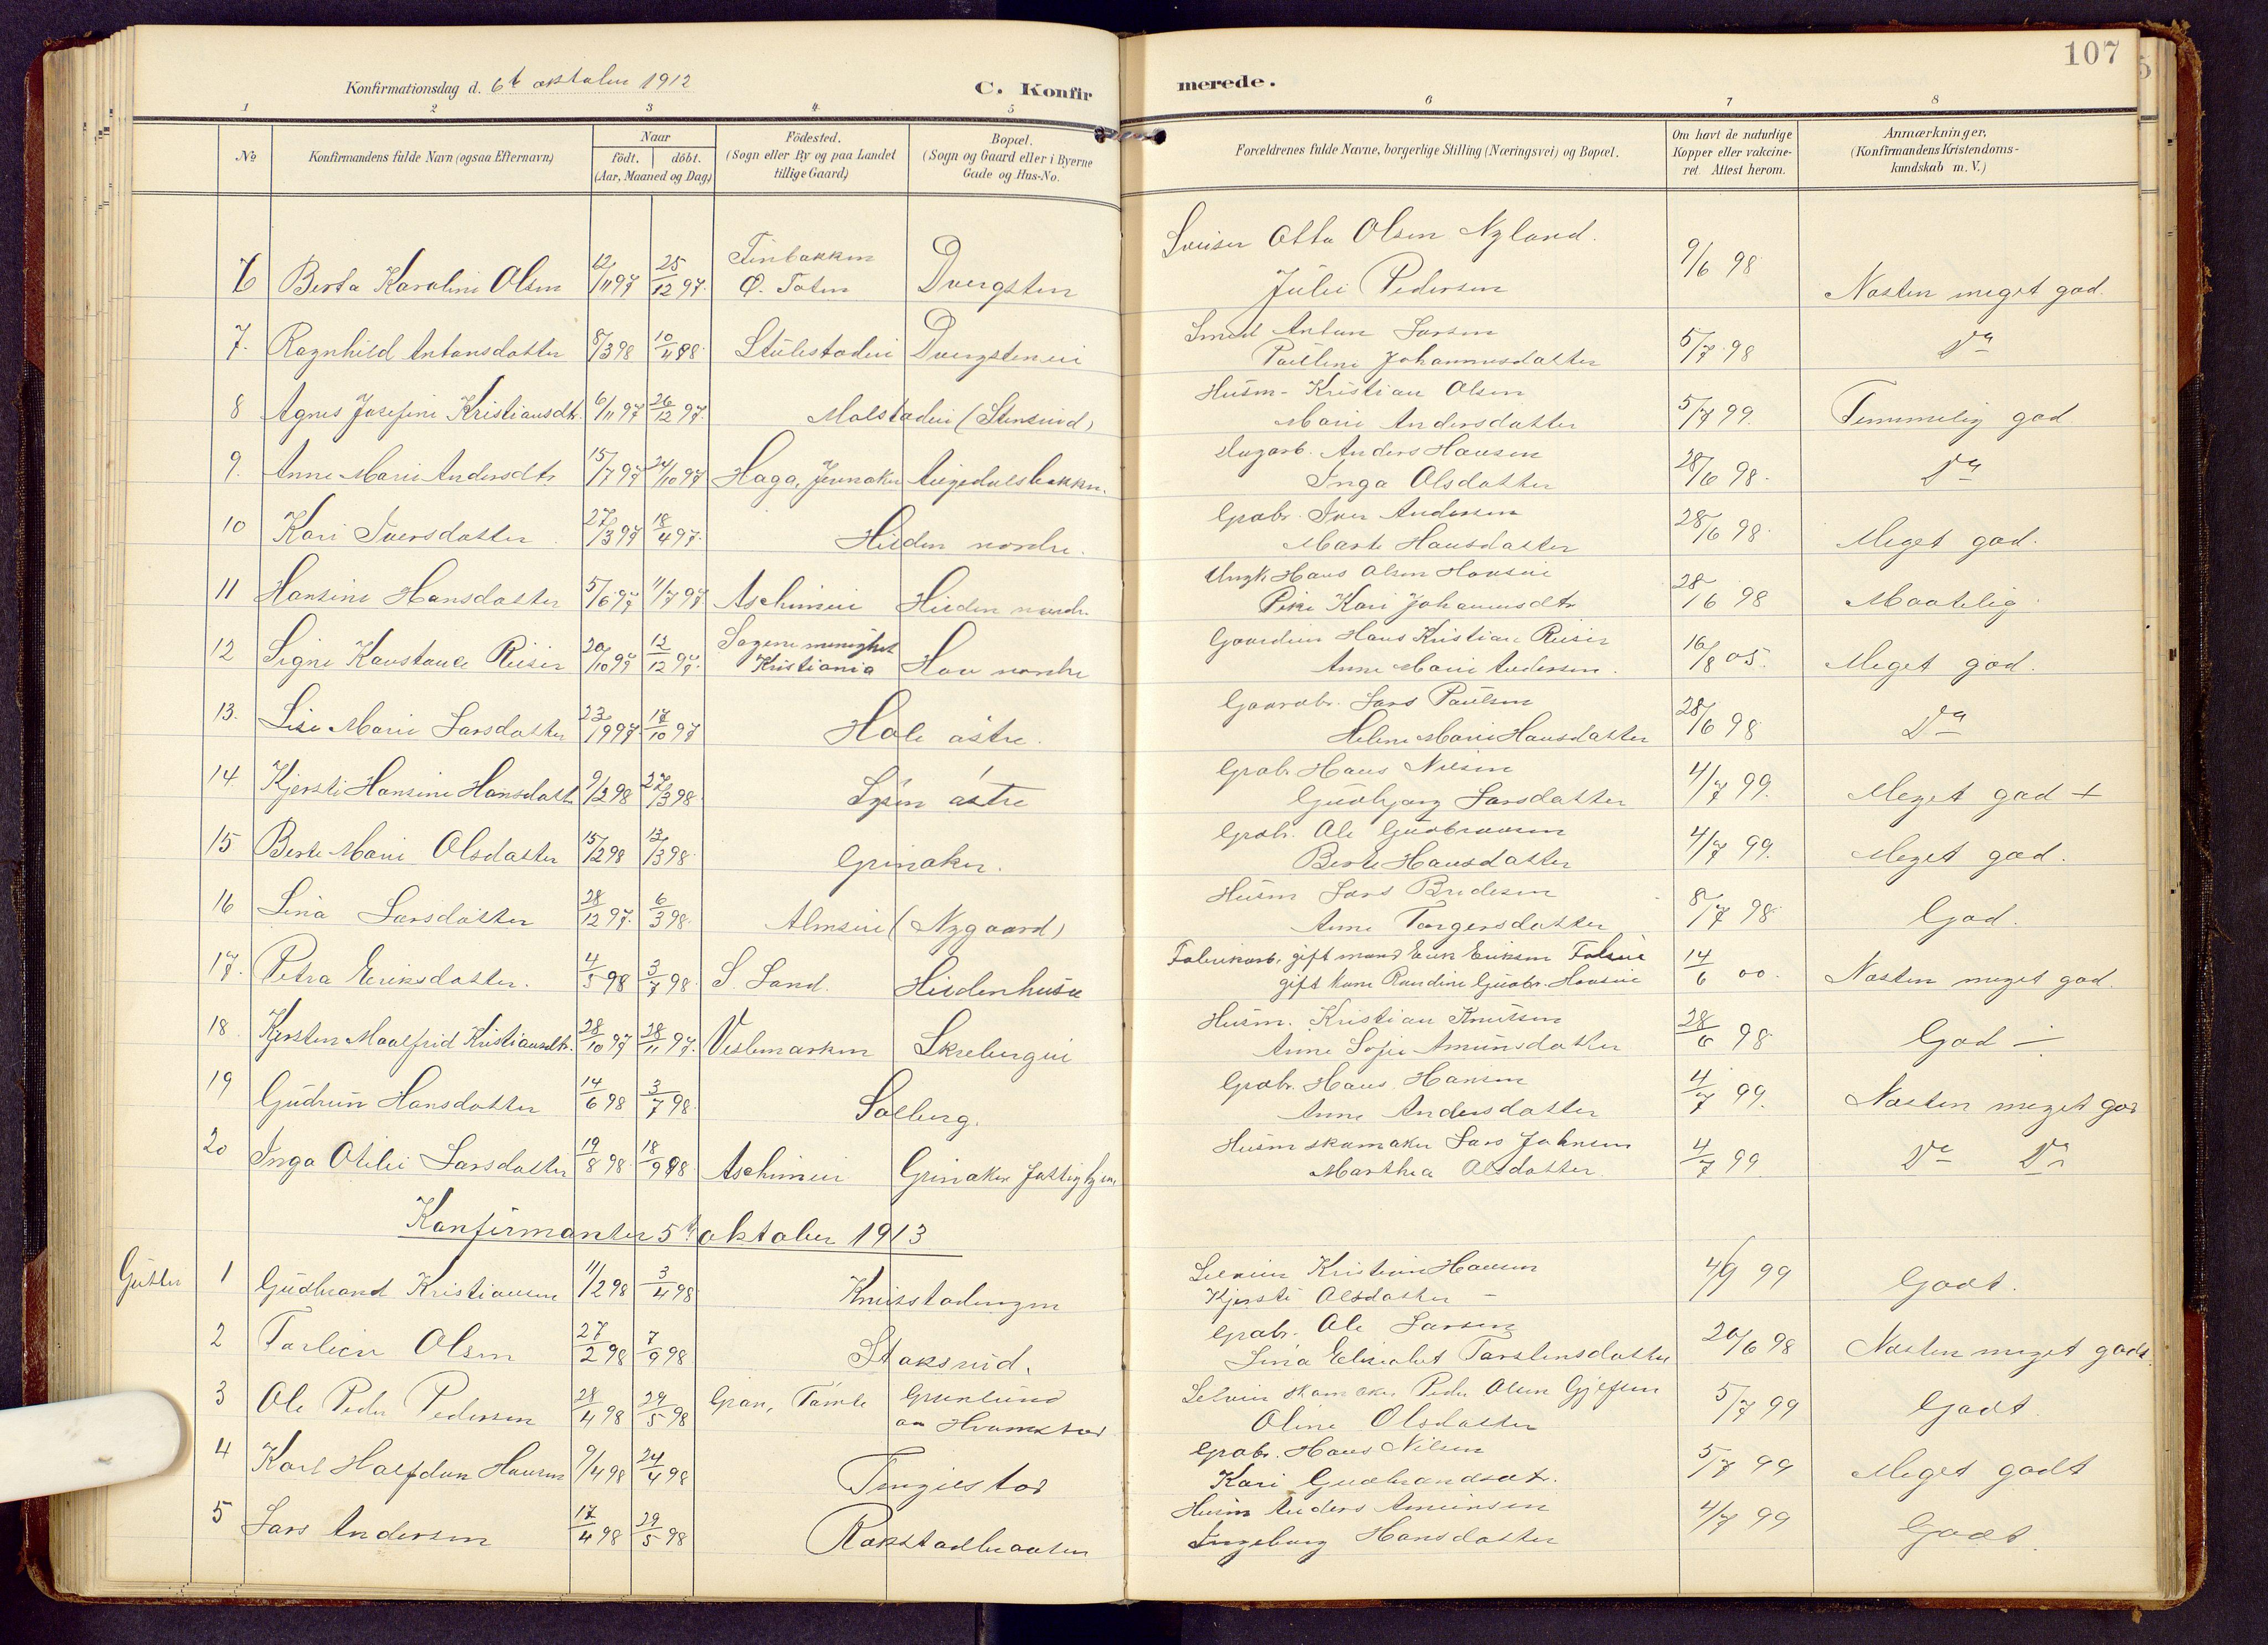 SAH, Brandbu prestekontor, Klokkerbok nr. 9, 1903-1916, s. 107